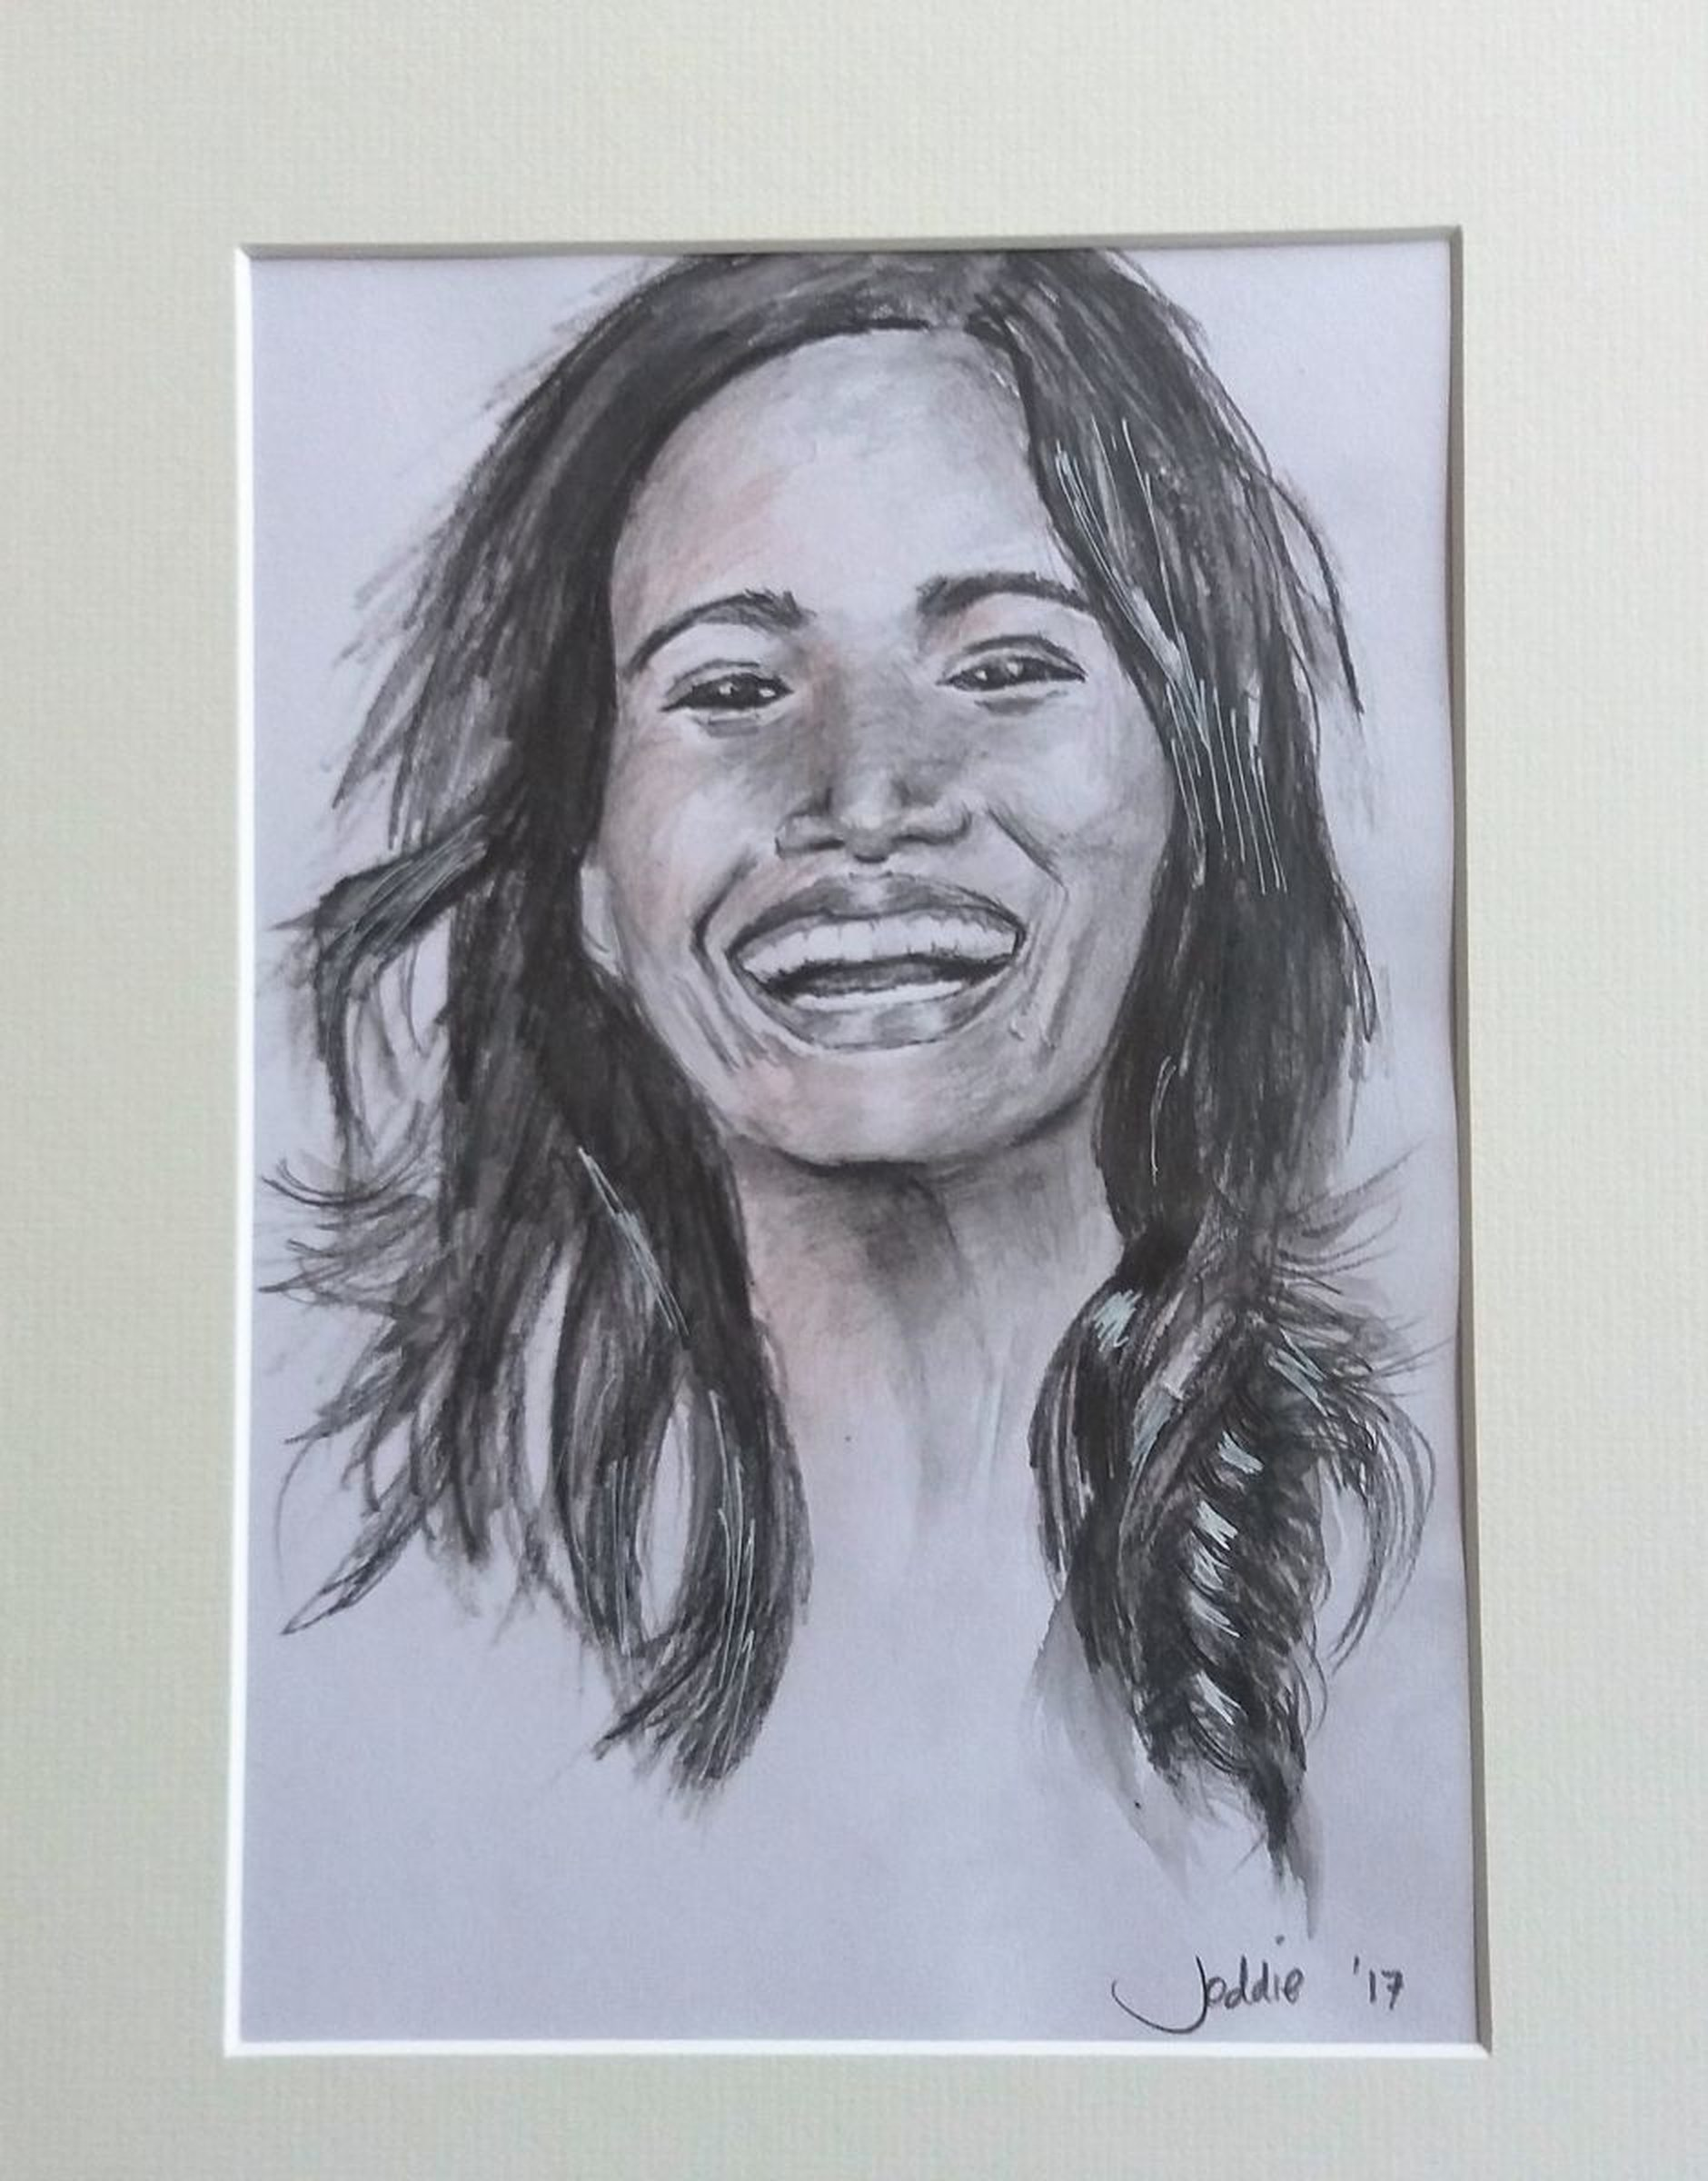 Big smile 2017 pencil drawing